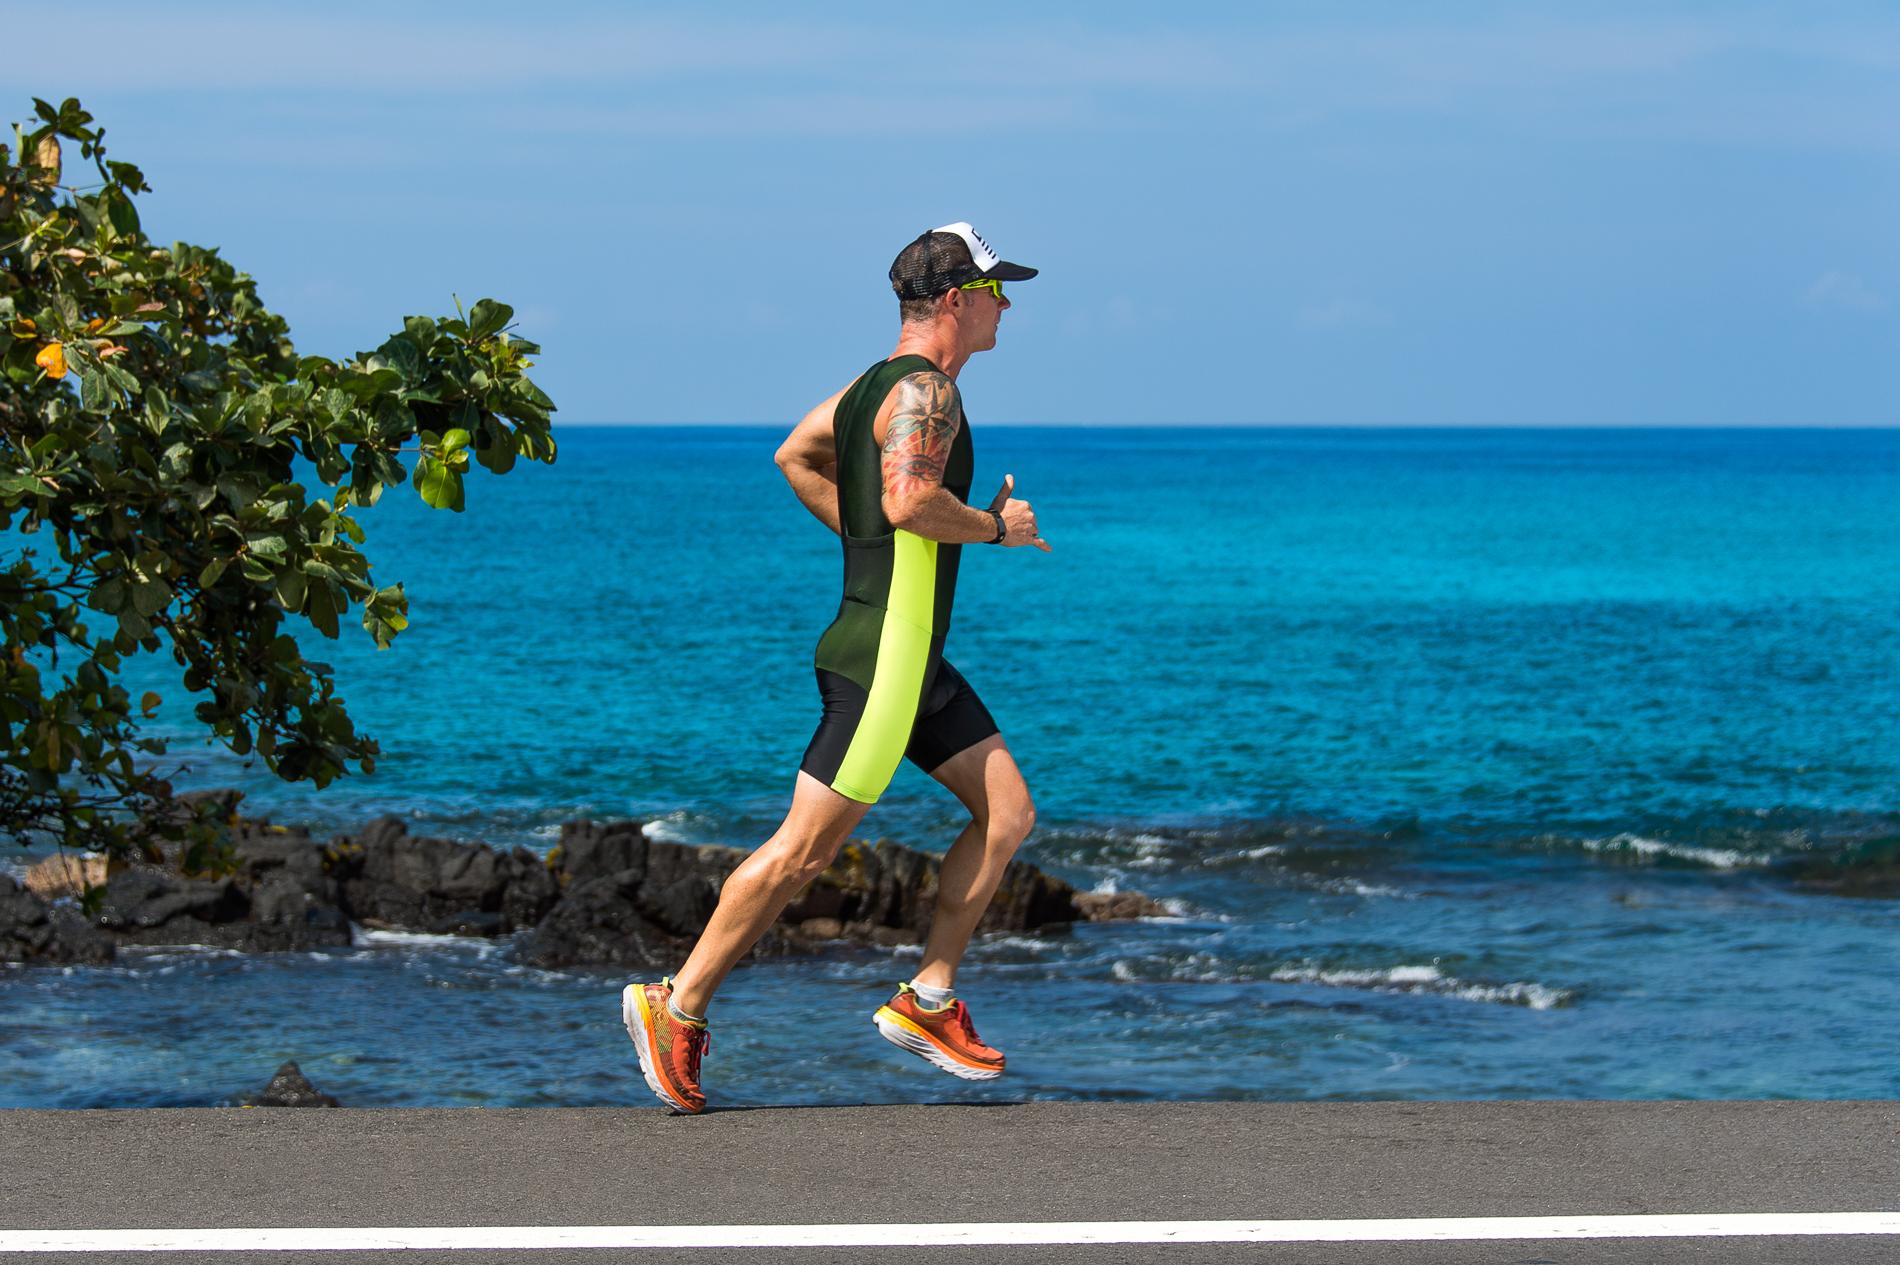 Ironman Triathlon Runner